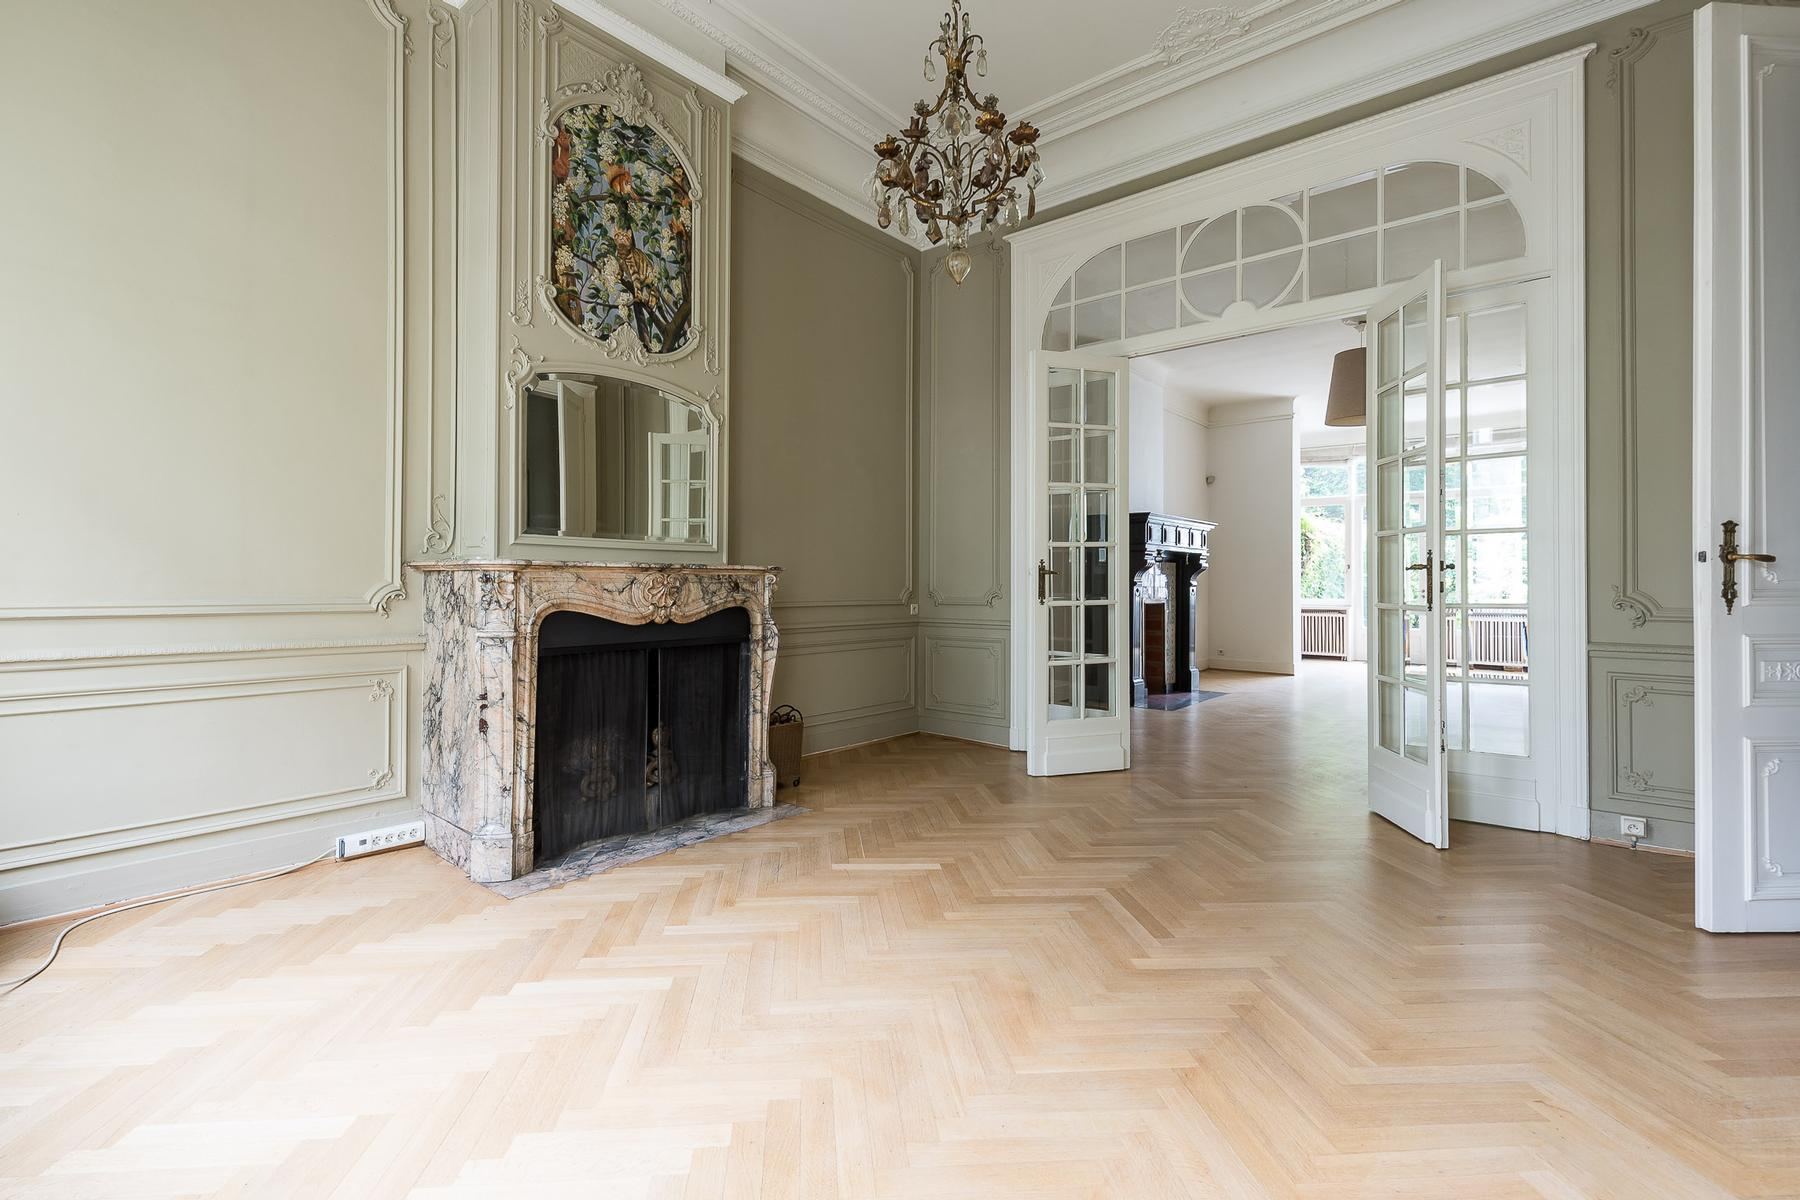 Other Residential for Rent at Ixelles I Place Brugmann 3 Avenue du Haut-Pont Brussels, Brussels, 1050 Belgium